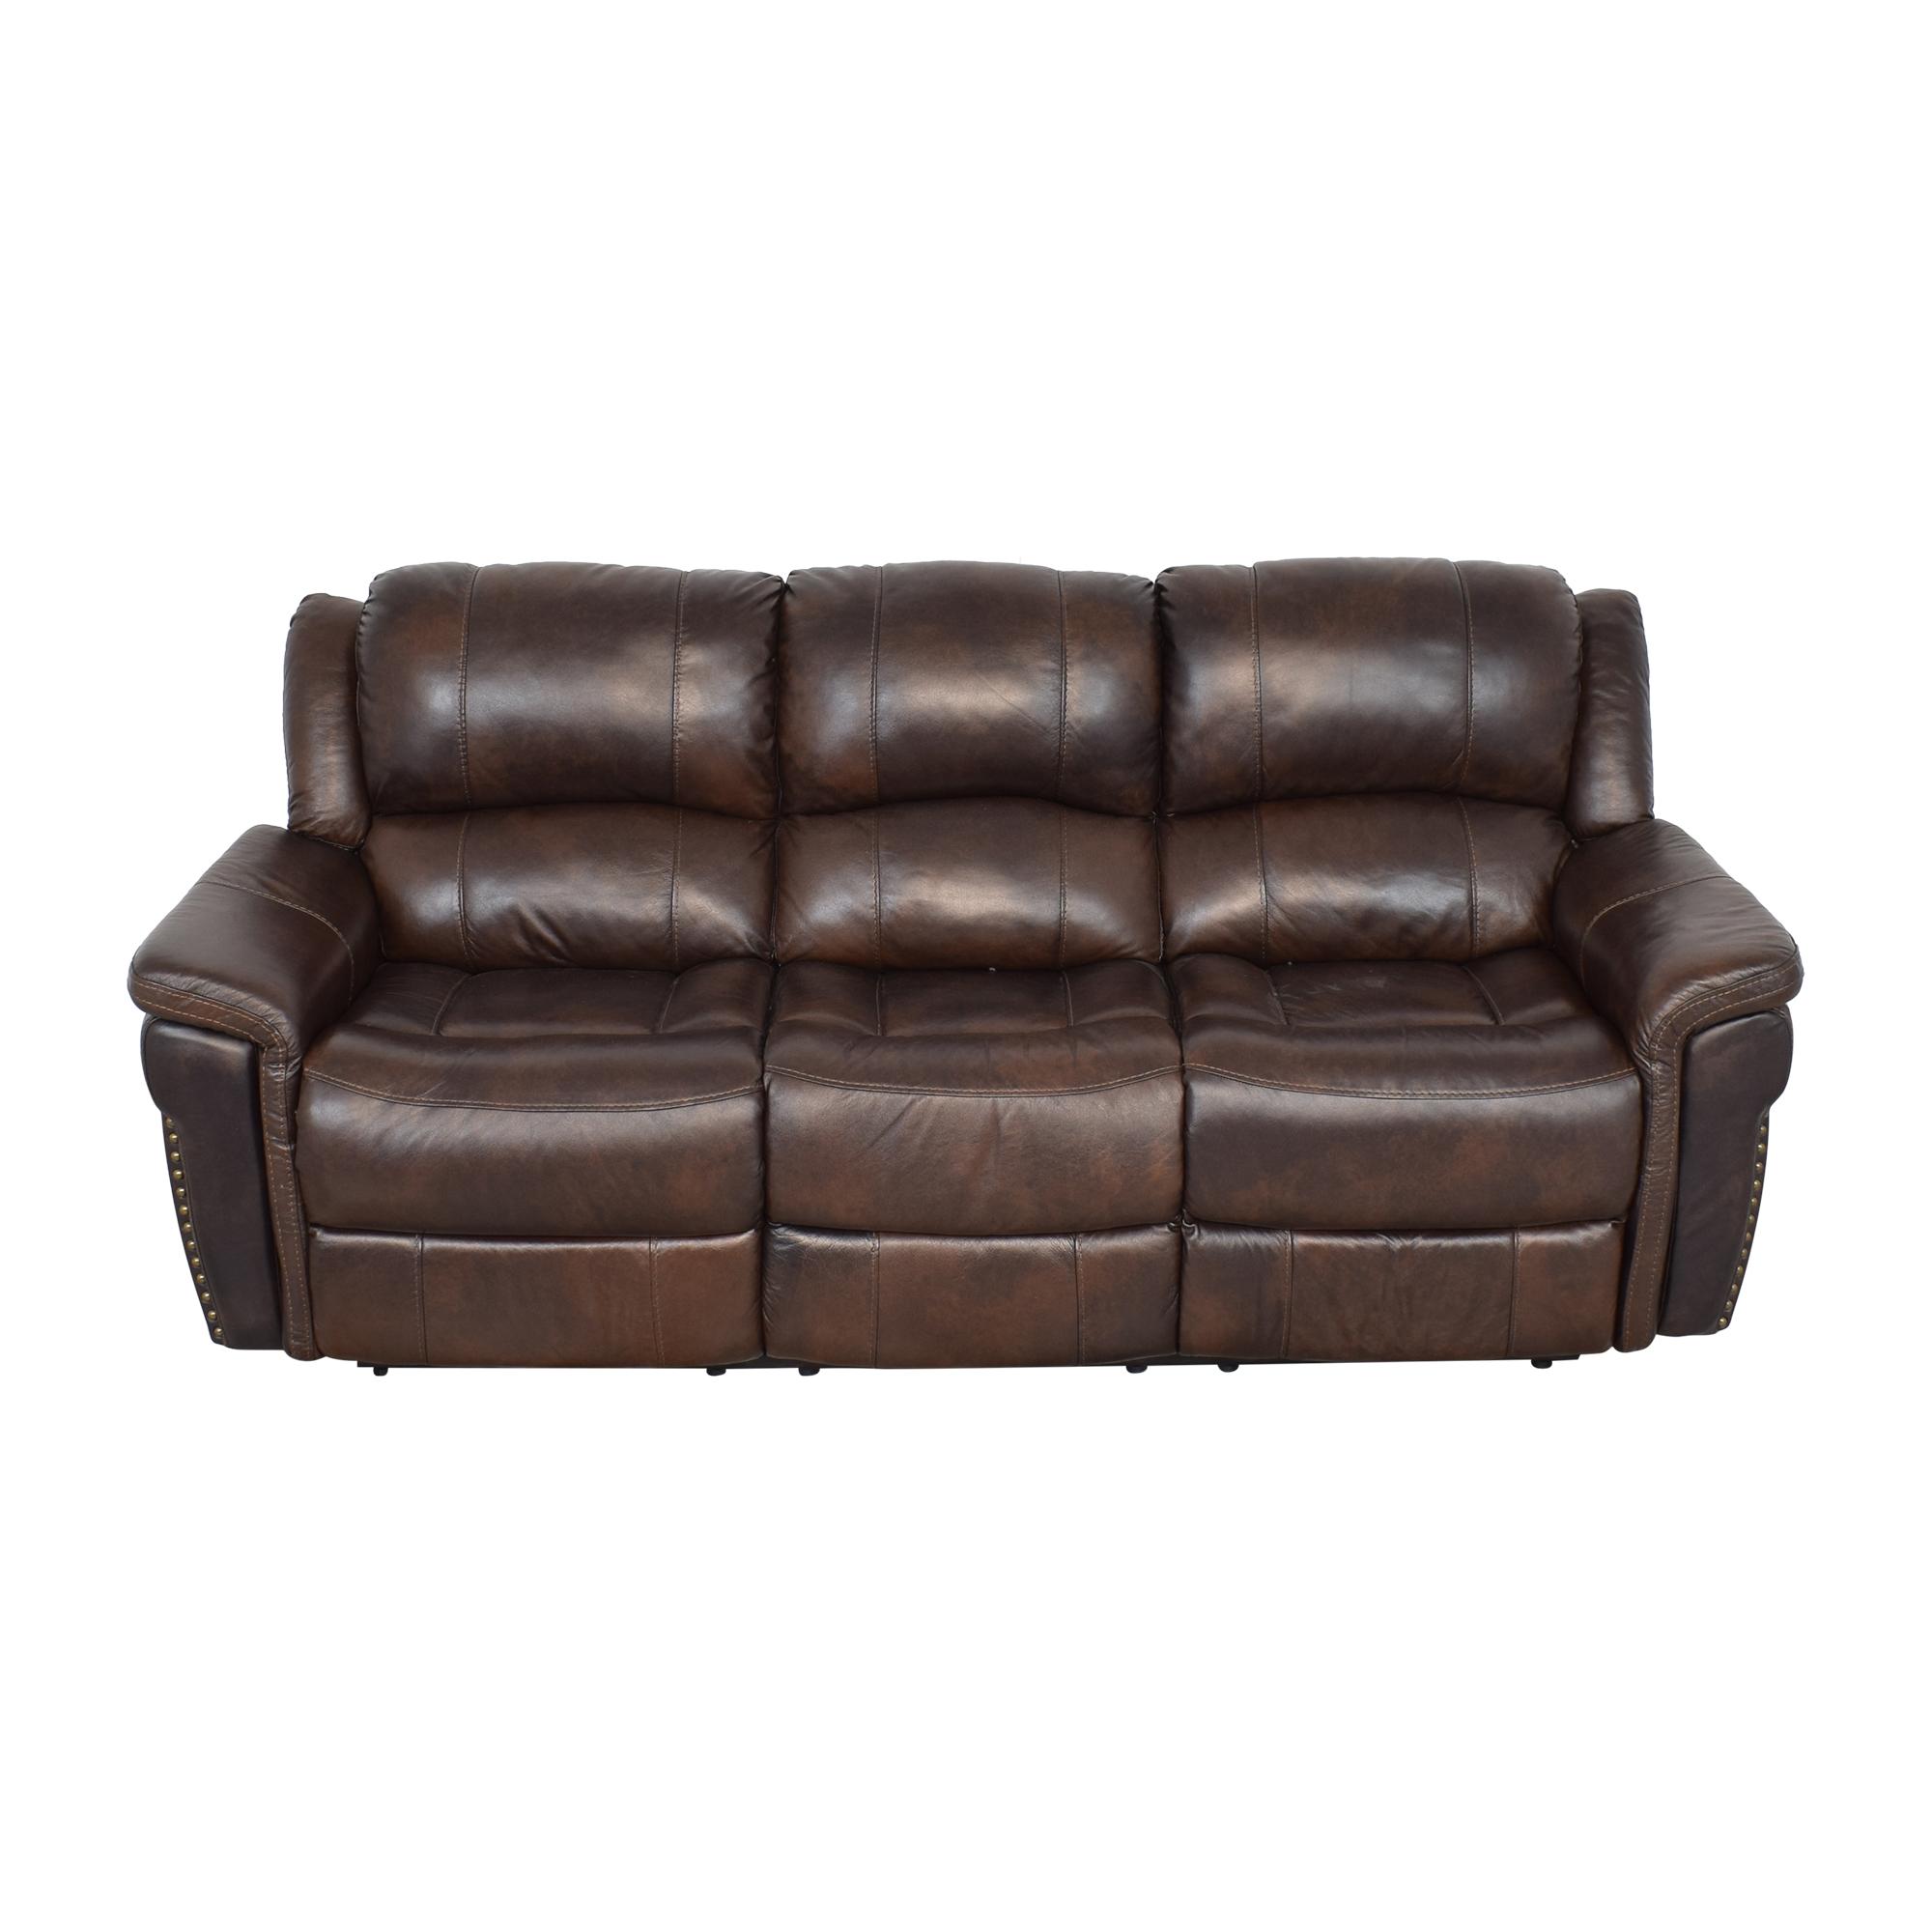 Delancey Street Furniture Recliner Sofa brown